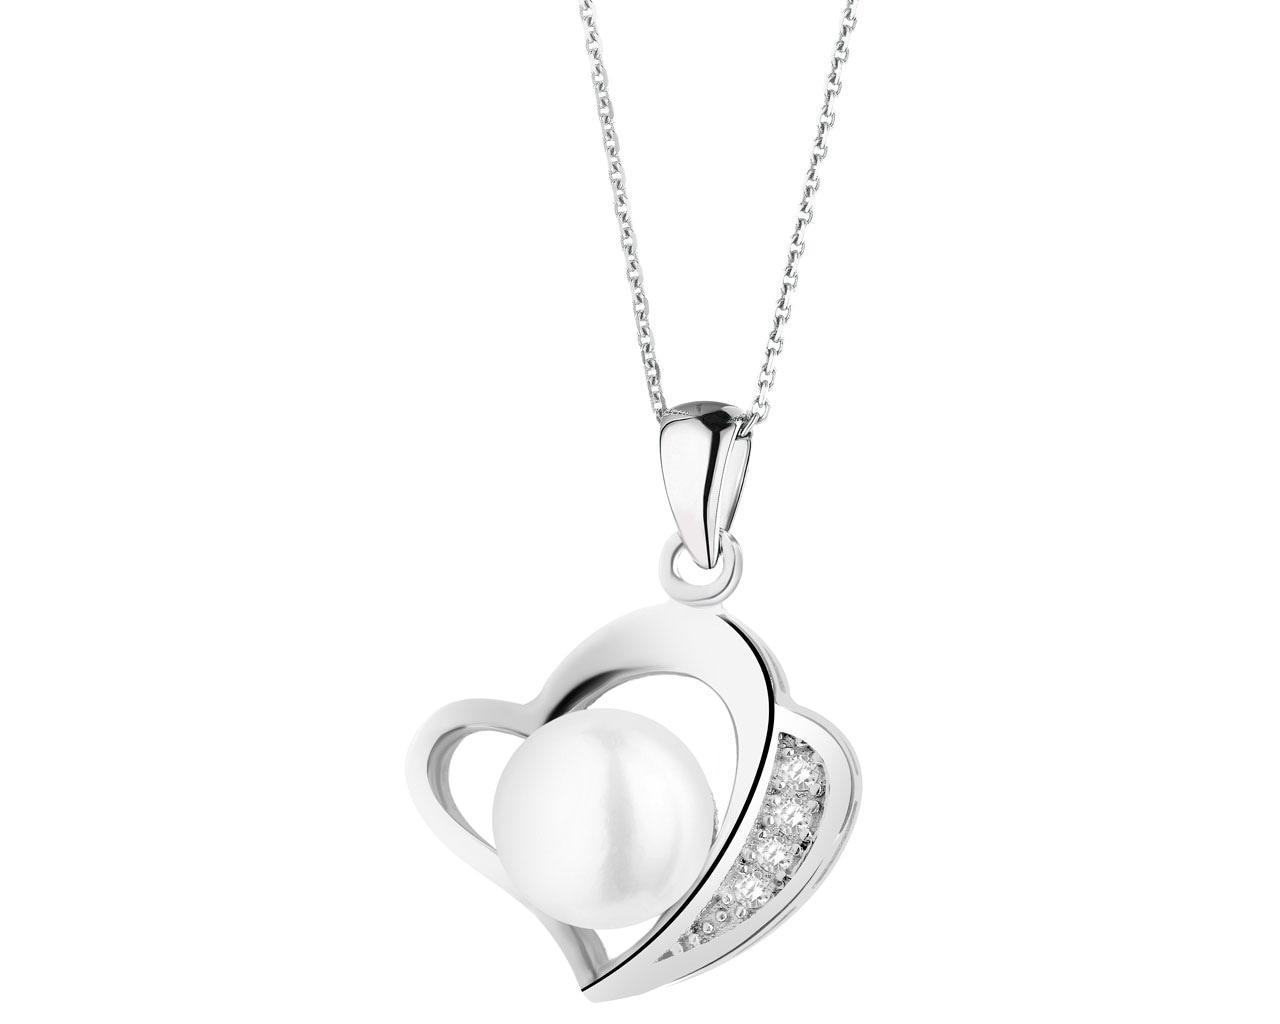 c00f67c3fe32e1 Zawieszka srebrna z perłą i cyrkoniami - serce